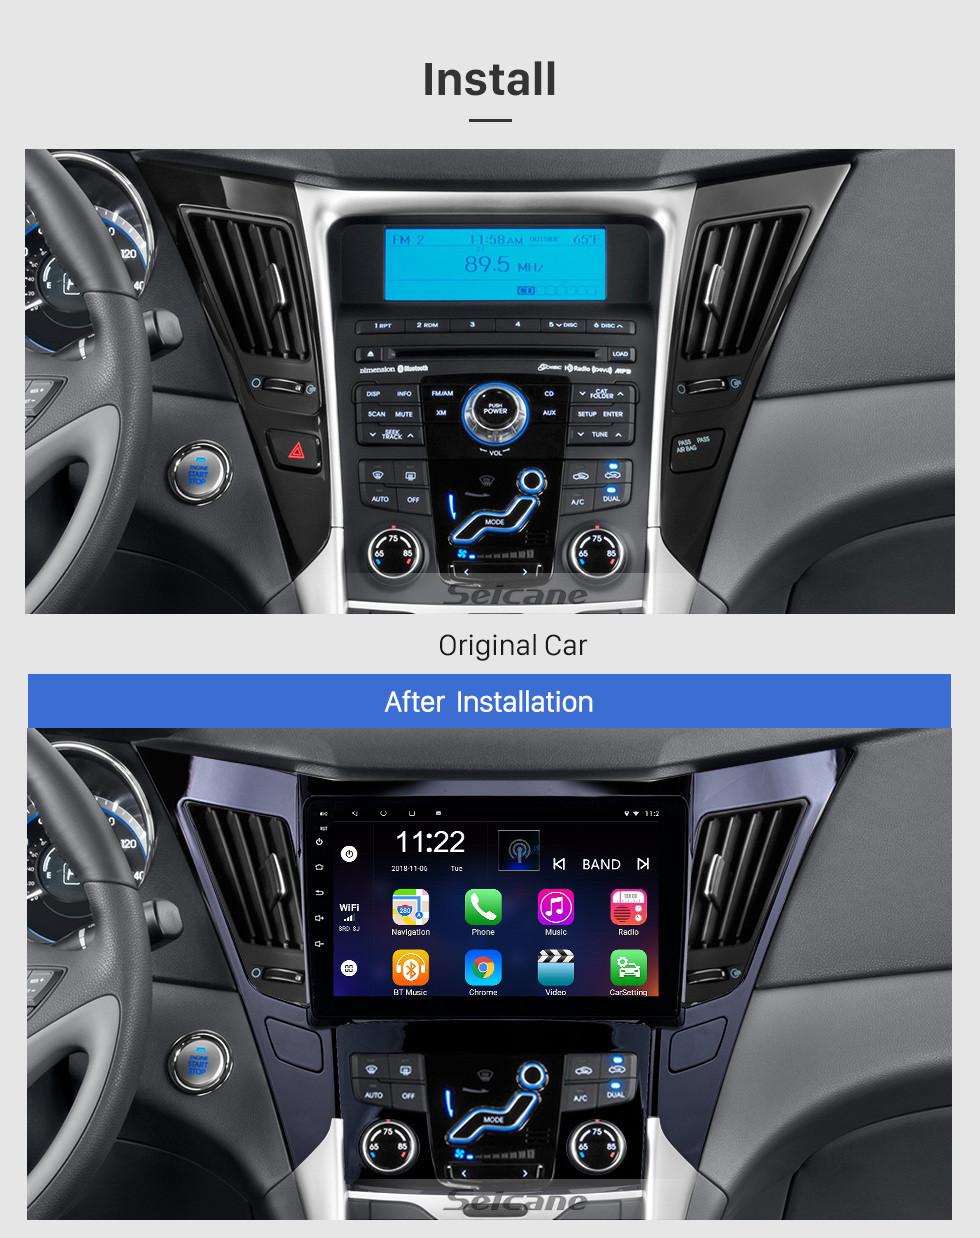 Seicane HD Touchscreen 2011-2015 Hyundai Sonata 8 Android 10.0 9 inch GPS Navigation Radio Bluetooth WIFI USB Carplay support DAB+ TPMS